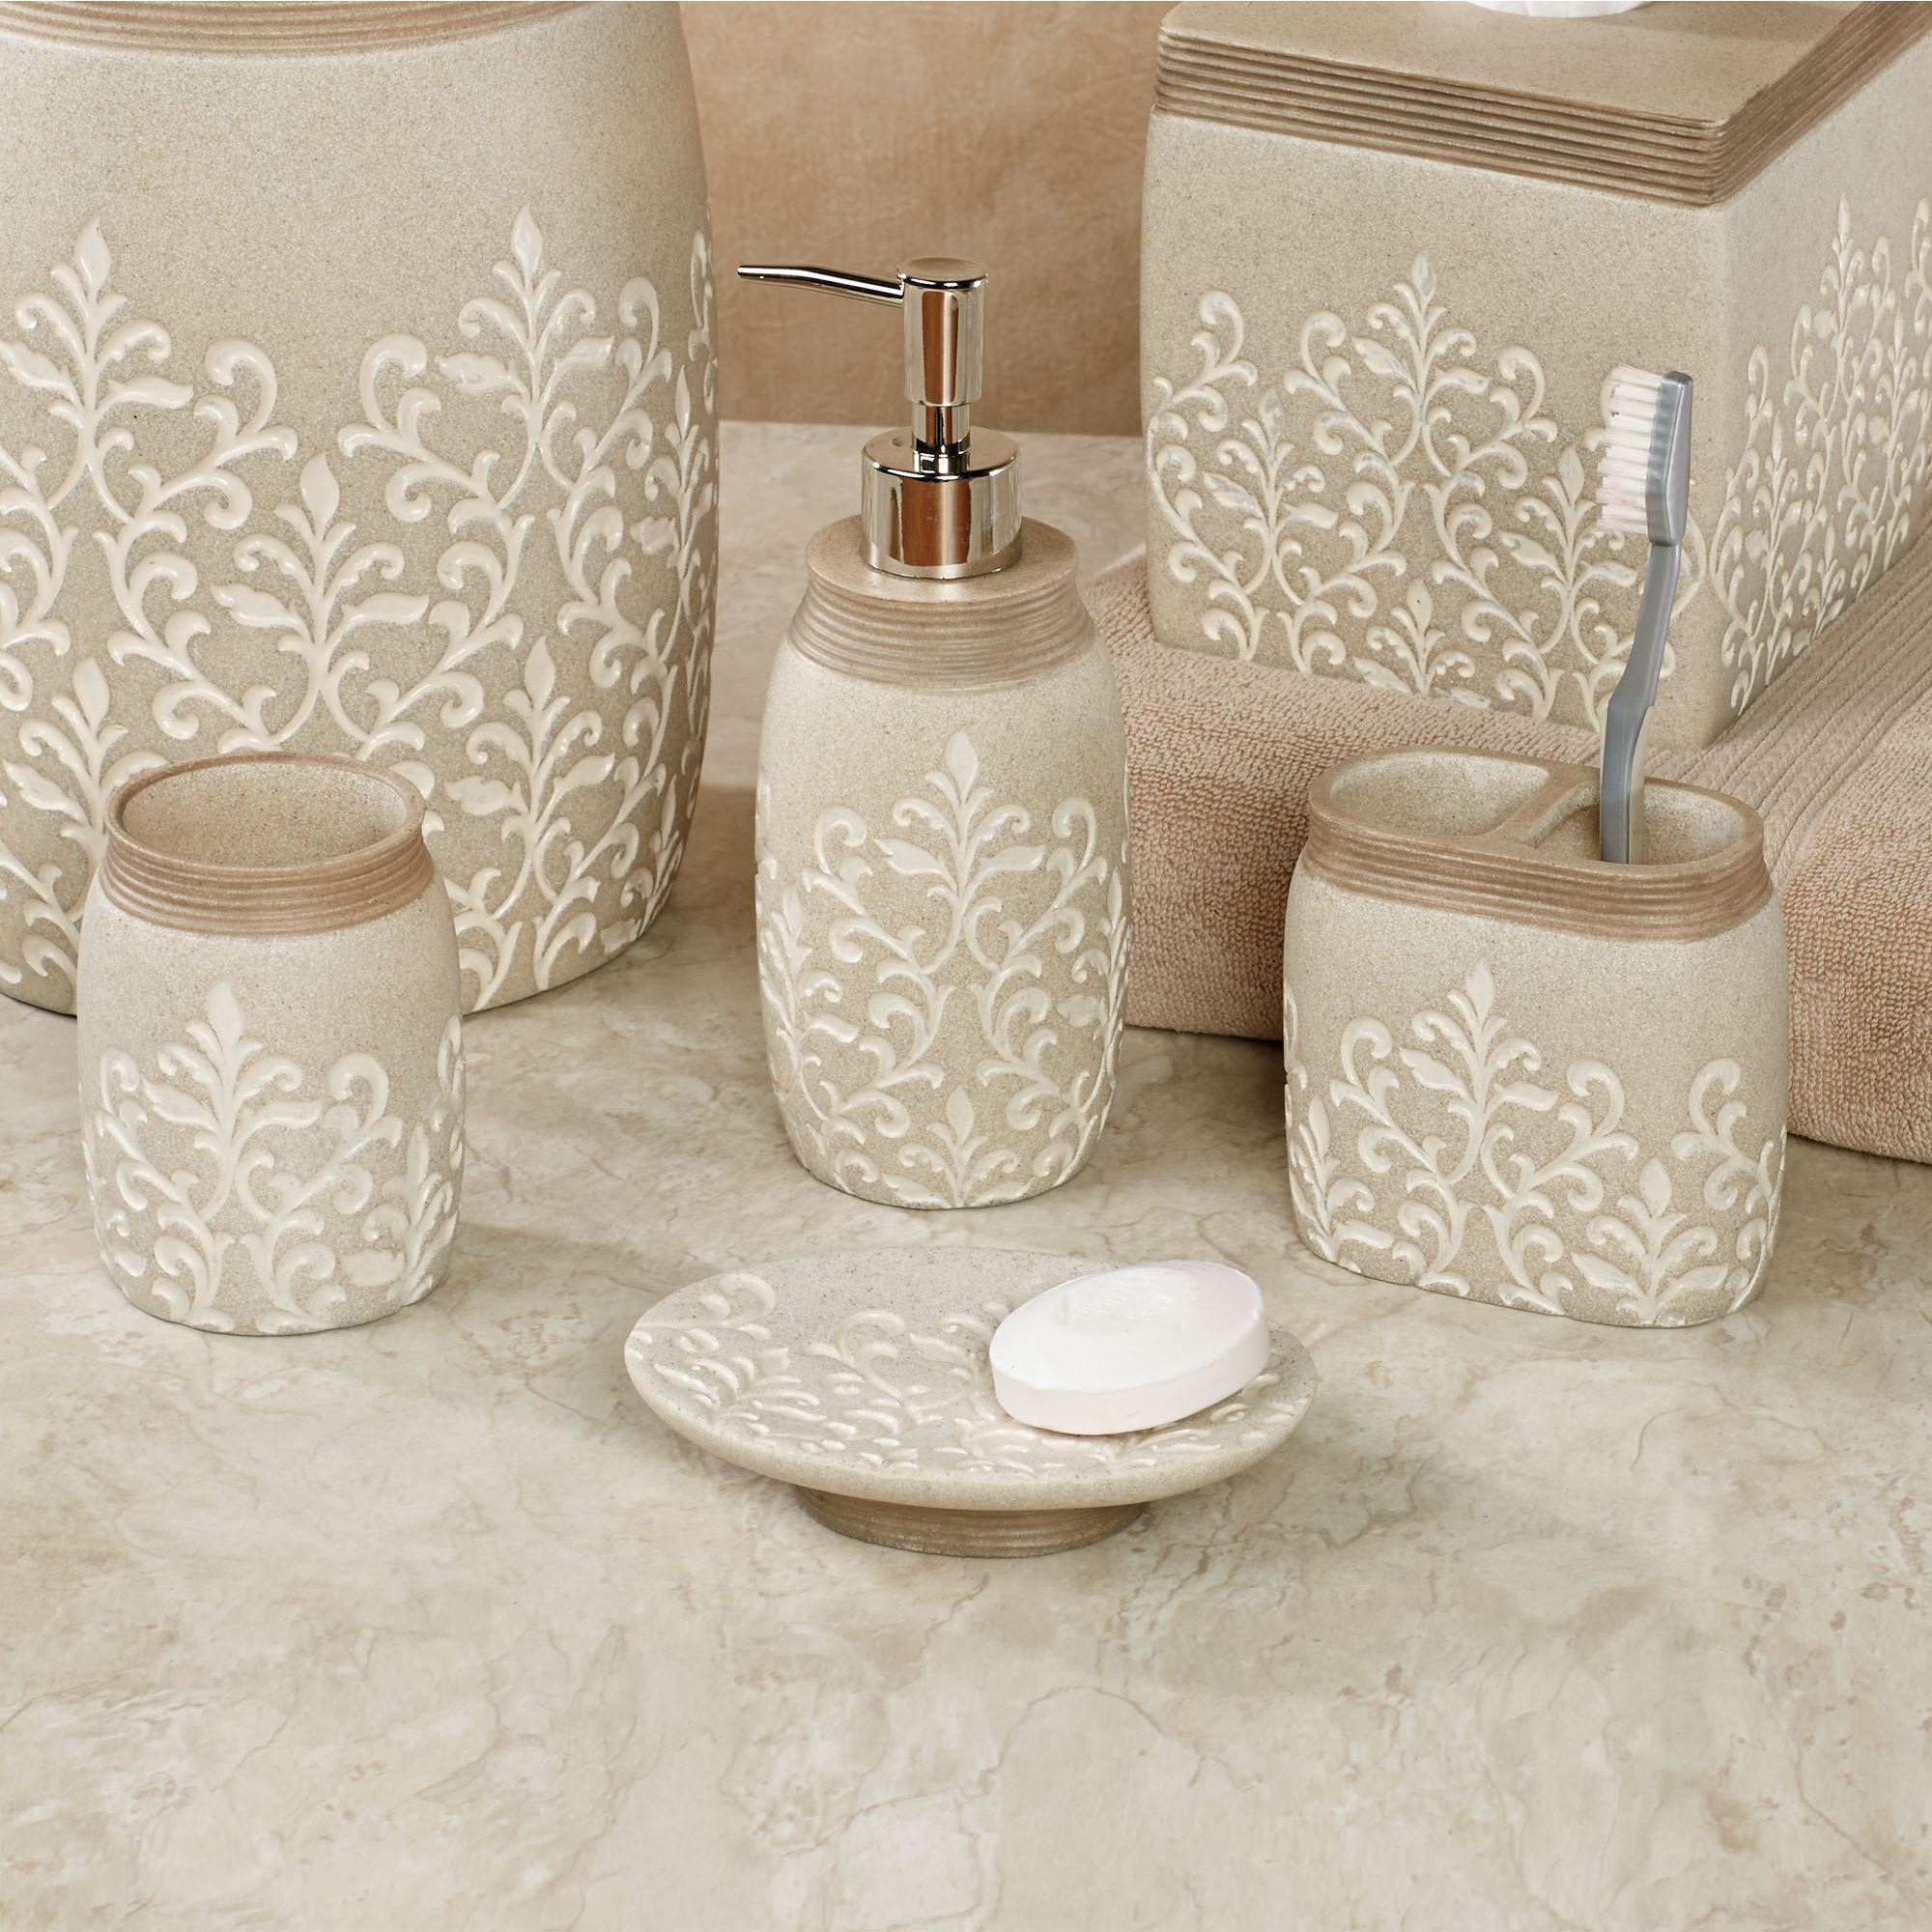 rhinestone bathroom accessories. Click to expand Verbena Bath Accessories by Veratex